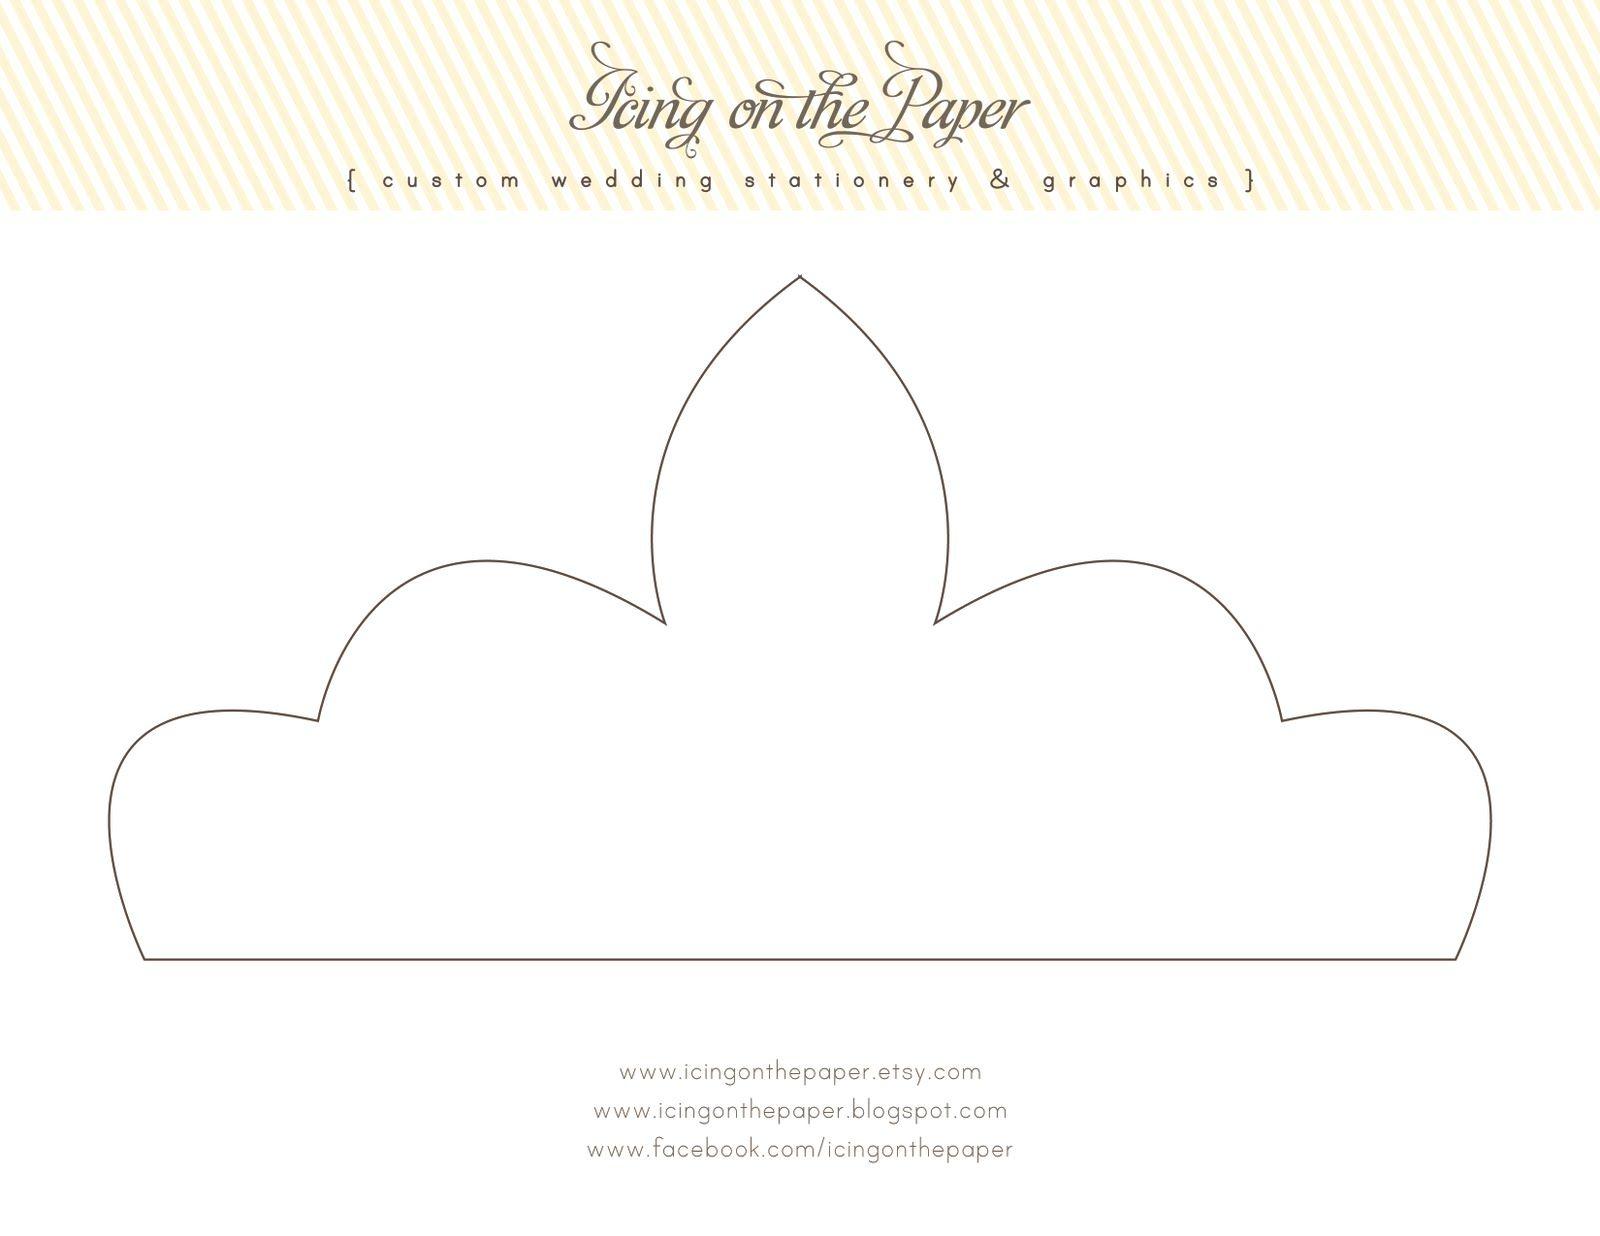 Free Printable Tiara Crown Template Diy Tiara Diy Crown